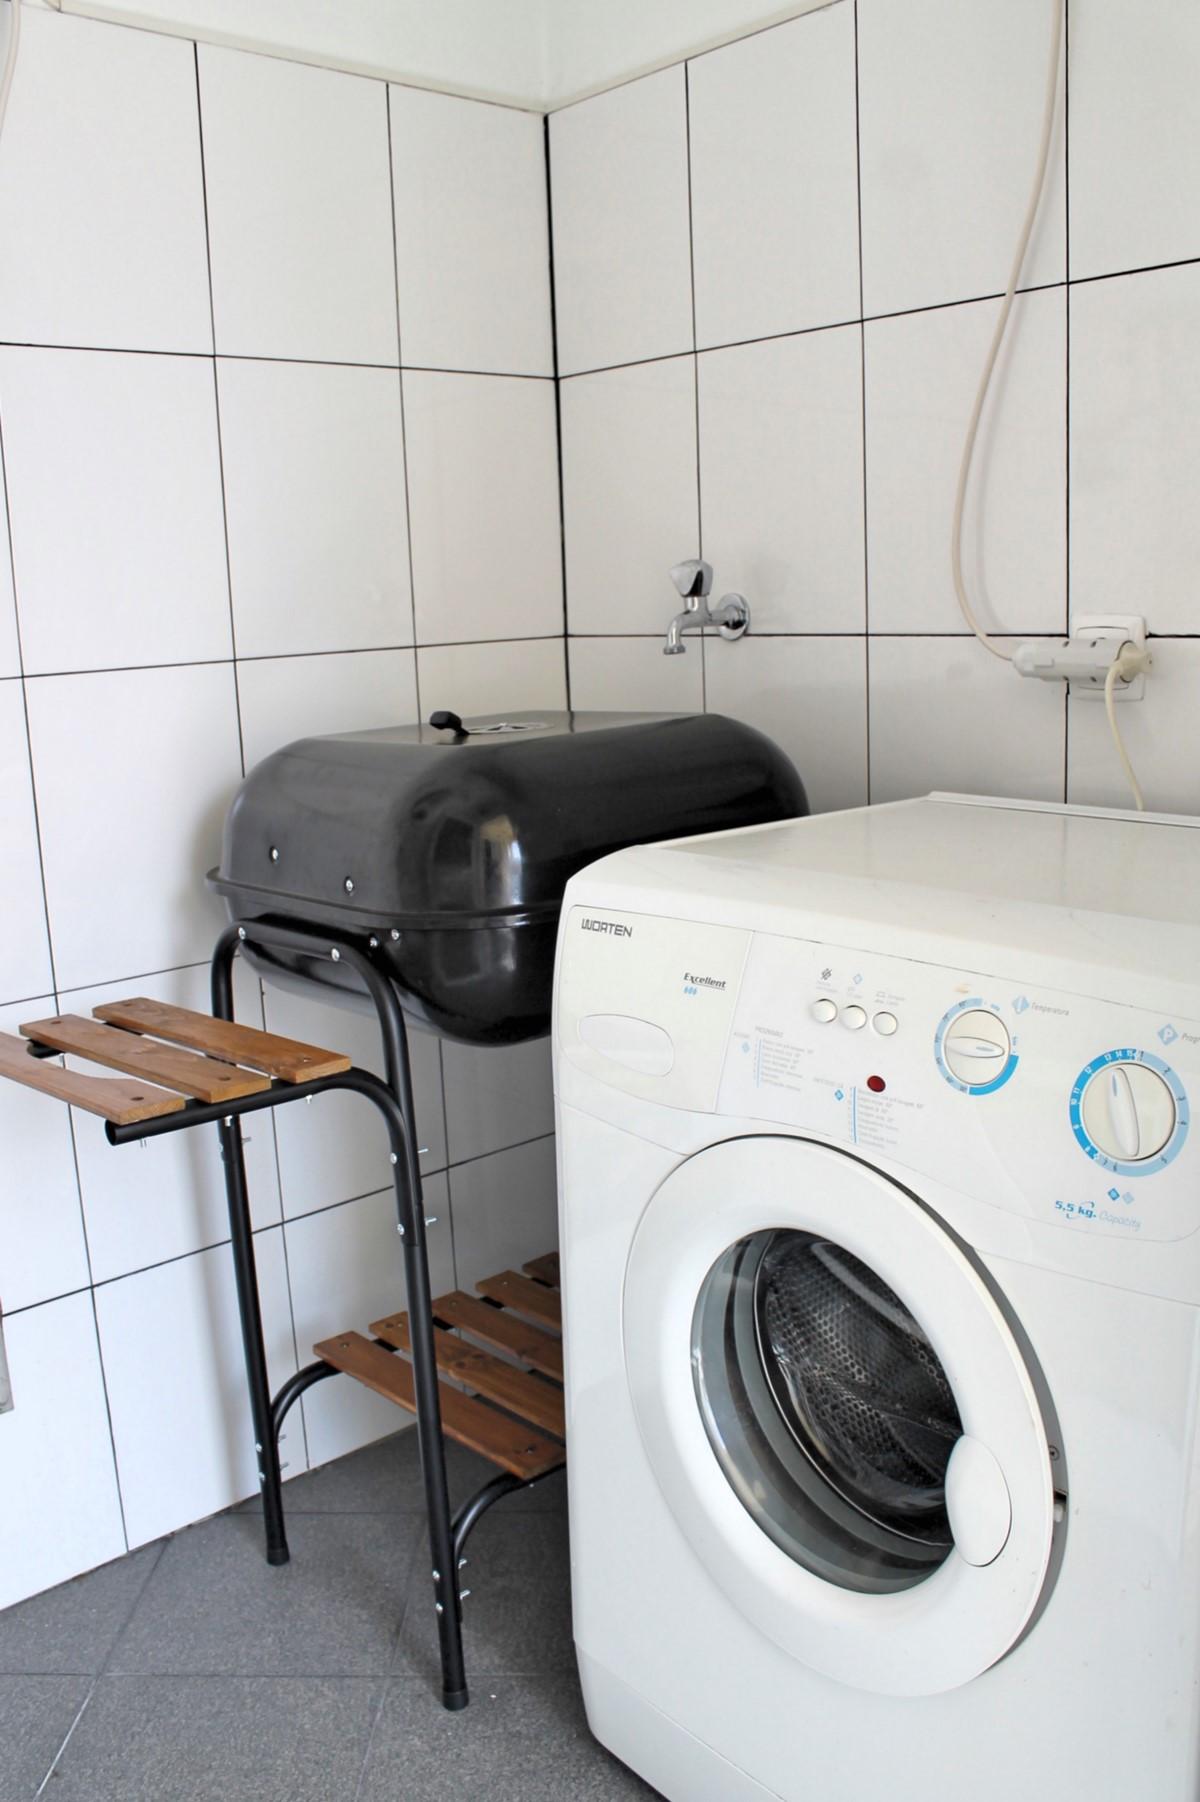 19 MHRD Casa Vigia Mar Laundry Room And Barbecue